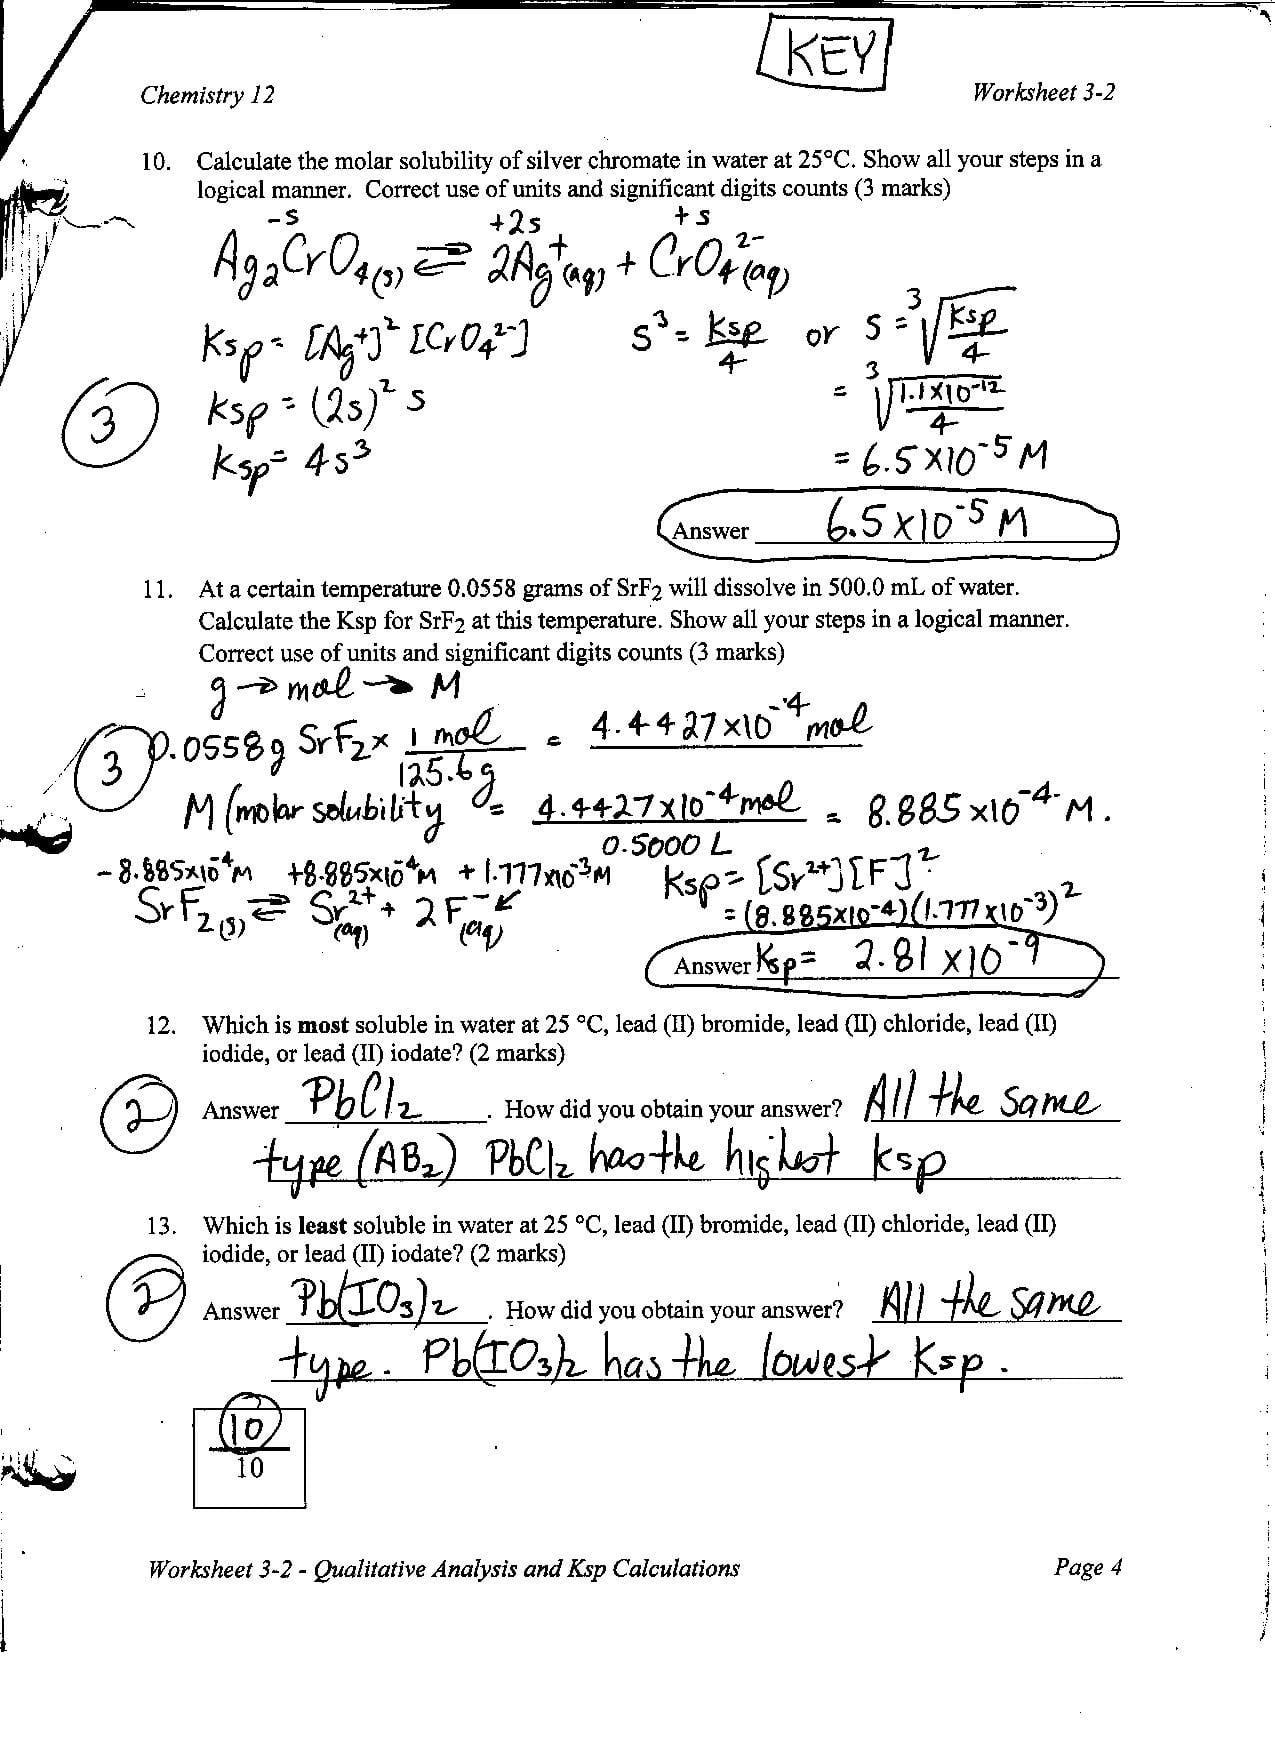 Chemistry Unit 4 Worksheet 2 Answers